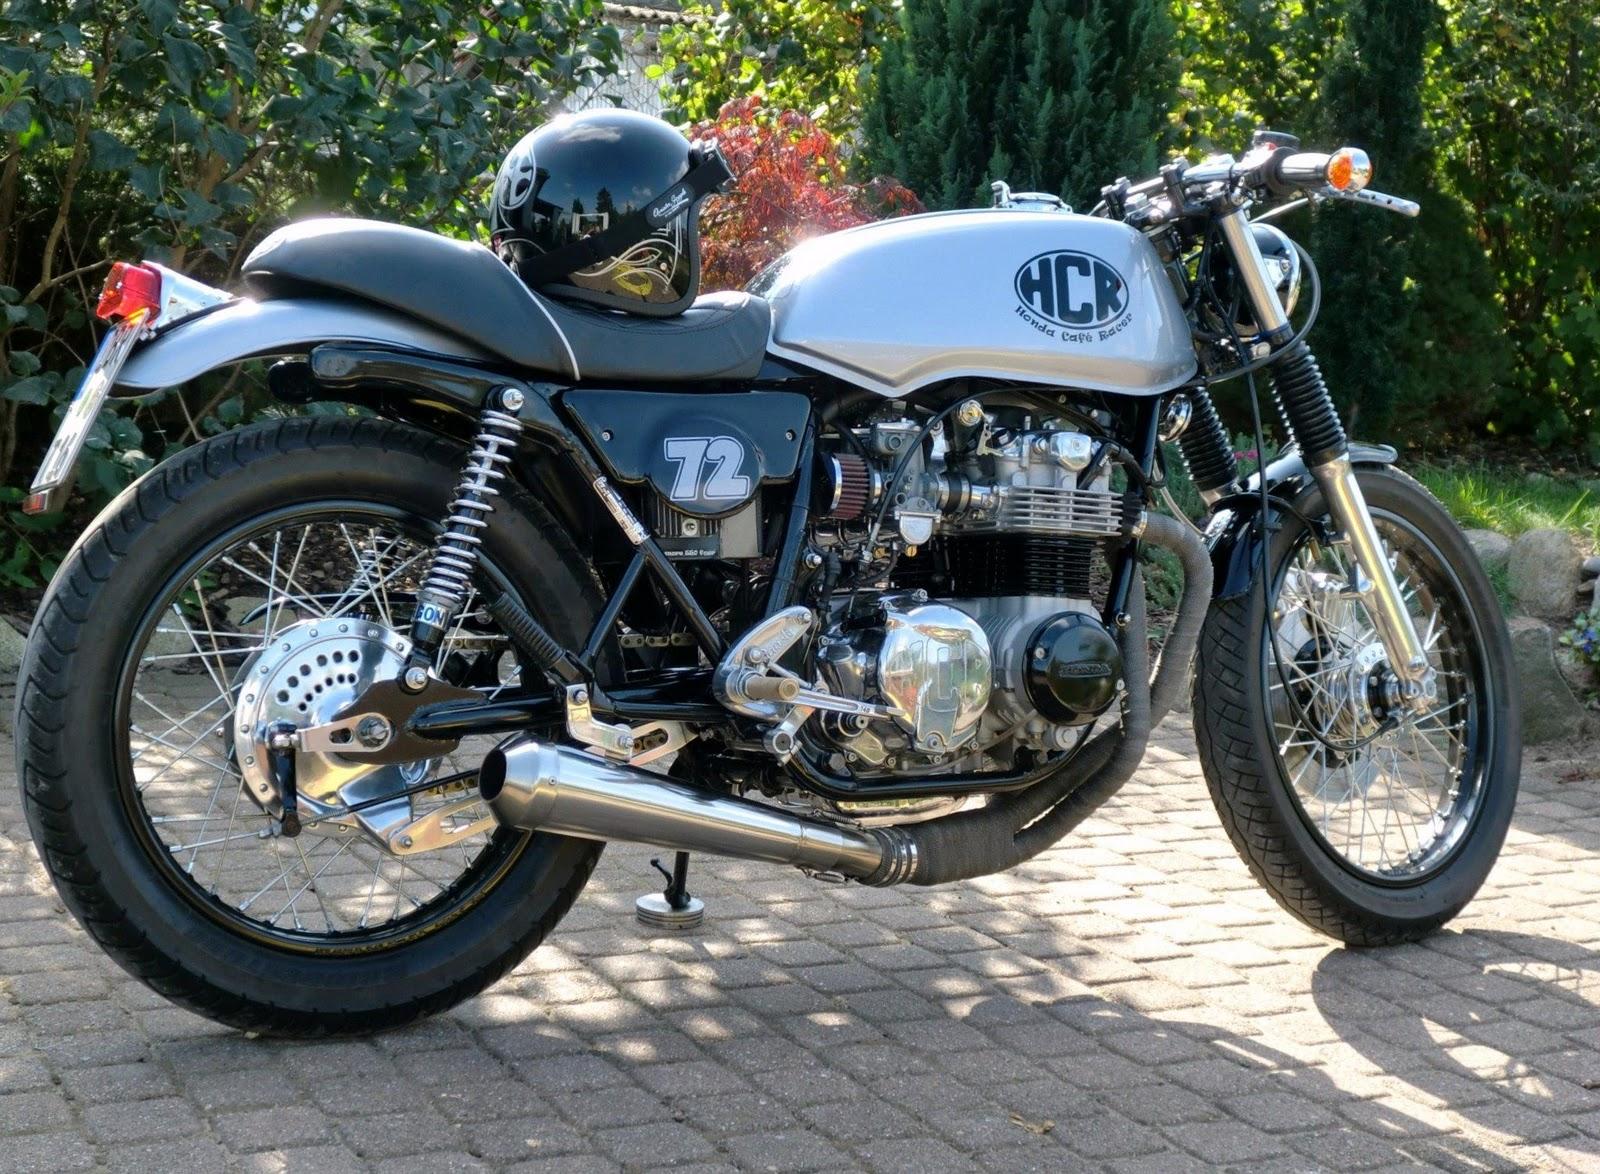 101 Modifikasi Motor Cb Extrem Modifikasi Motor Honda CB Terbaru